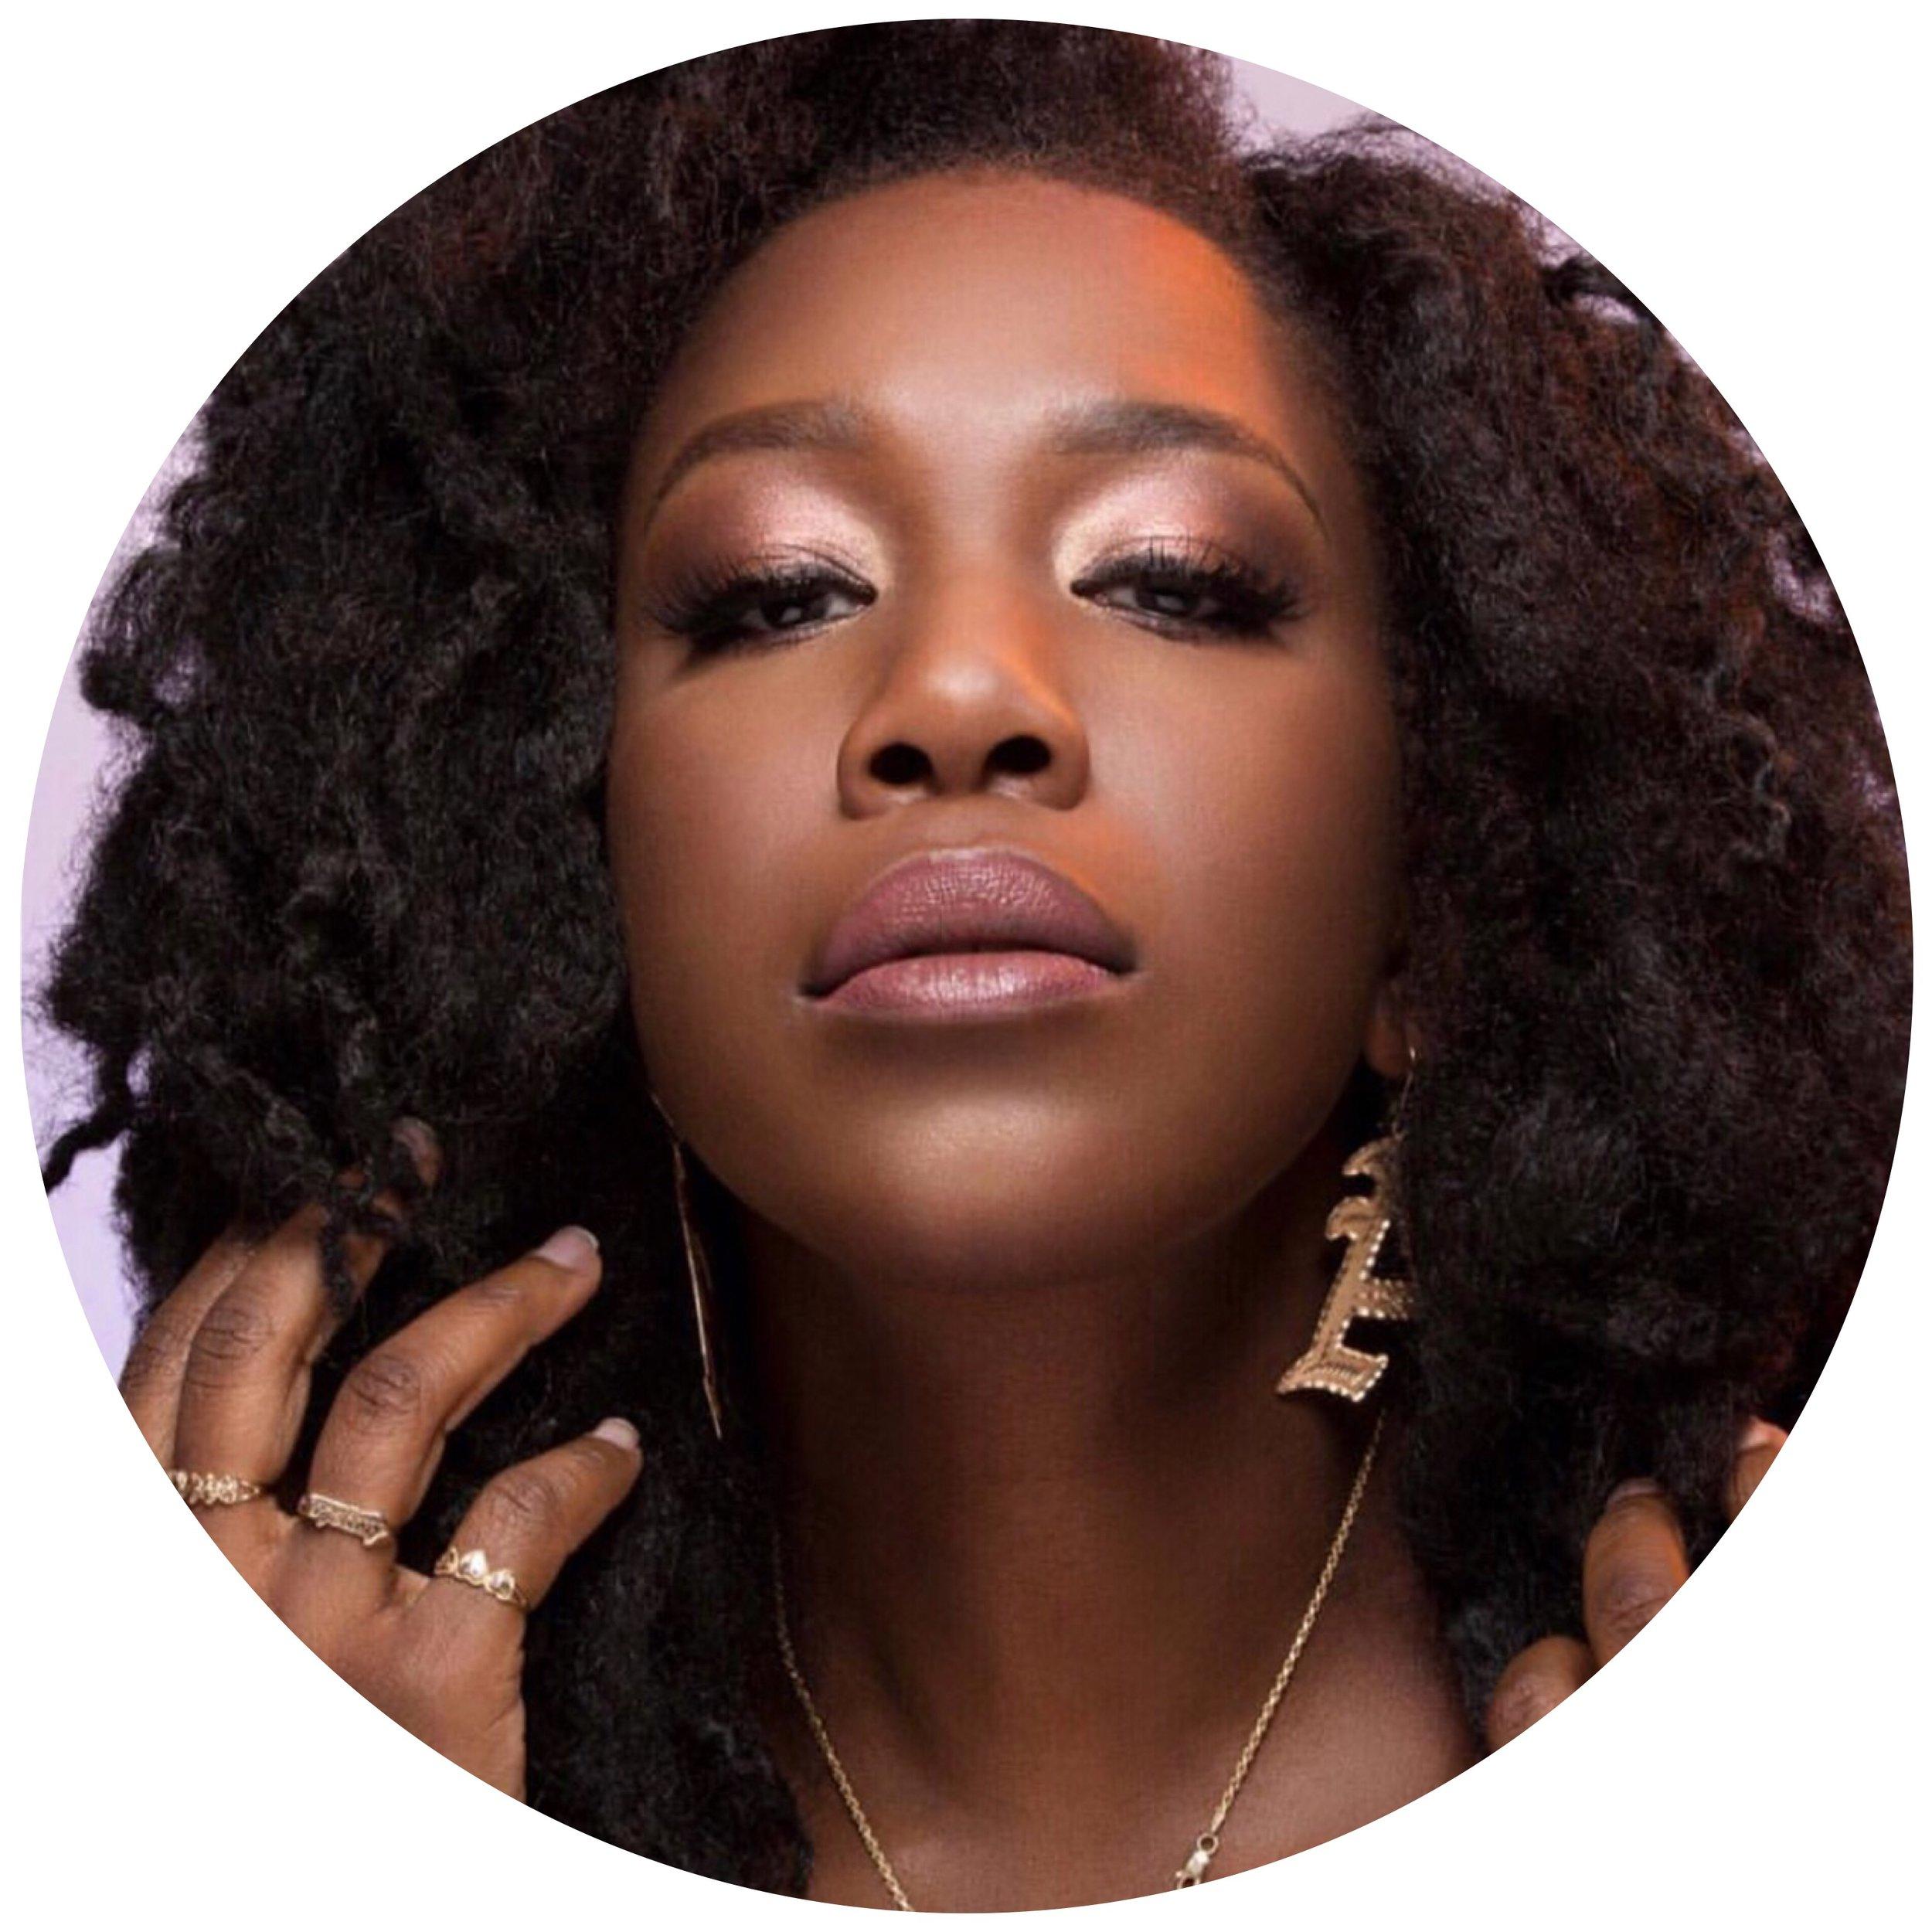 Angela.B.Adwoa on instagram Queen adwoa's Closet Owner.JPG